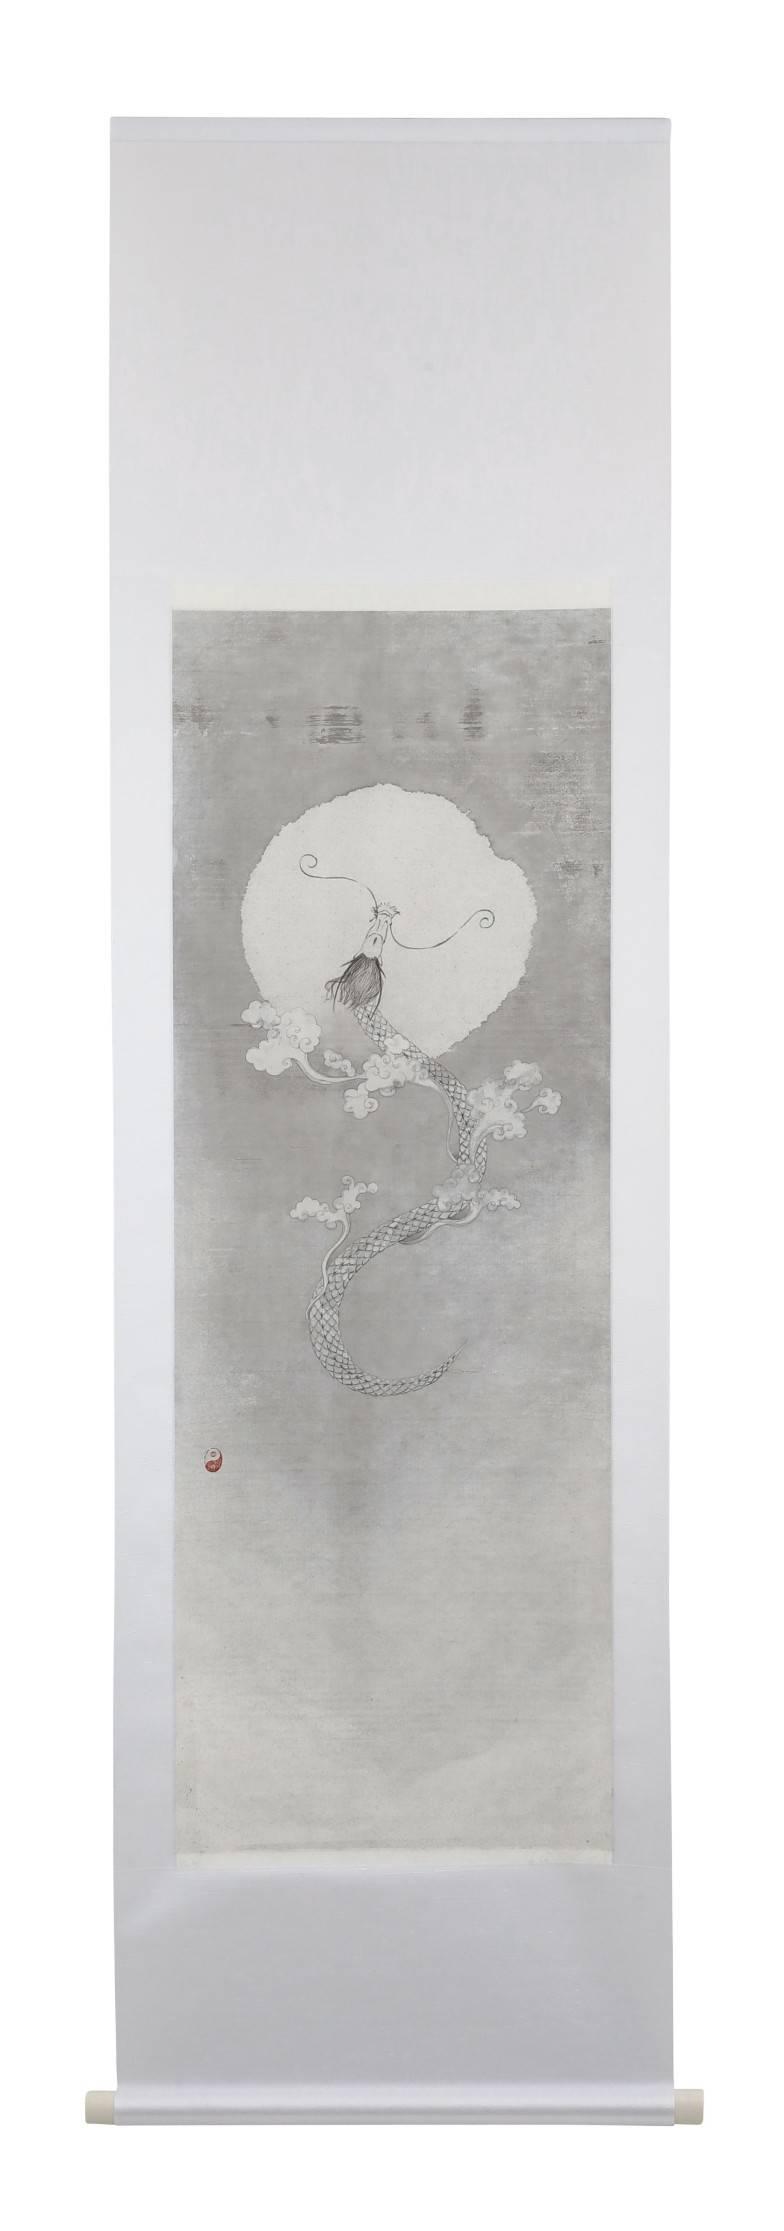 "White dragon ""Kakita River"" - integrate black with white"